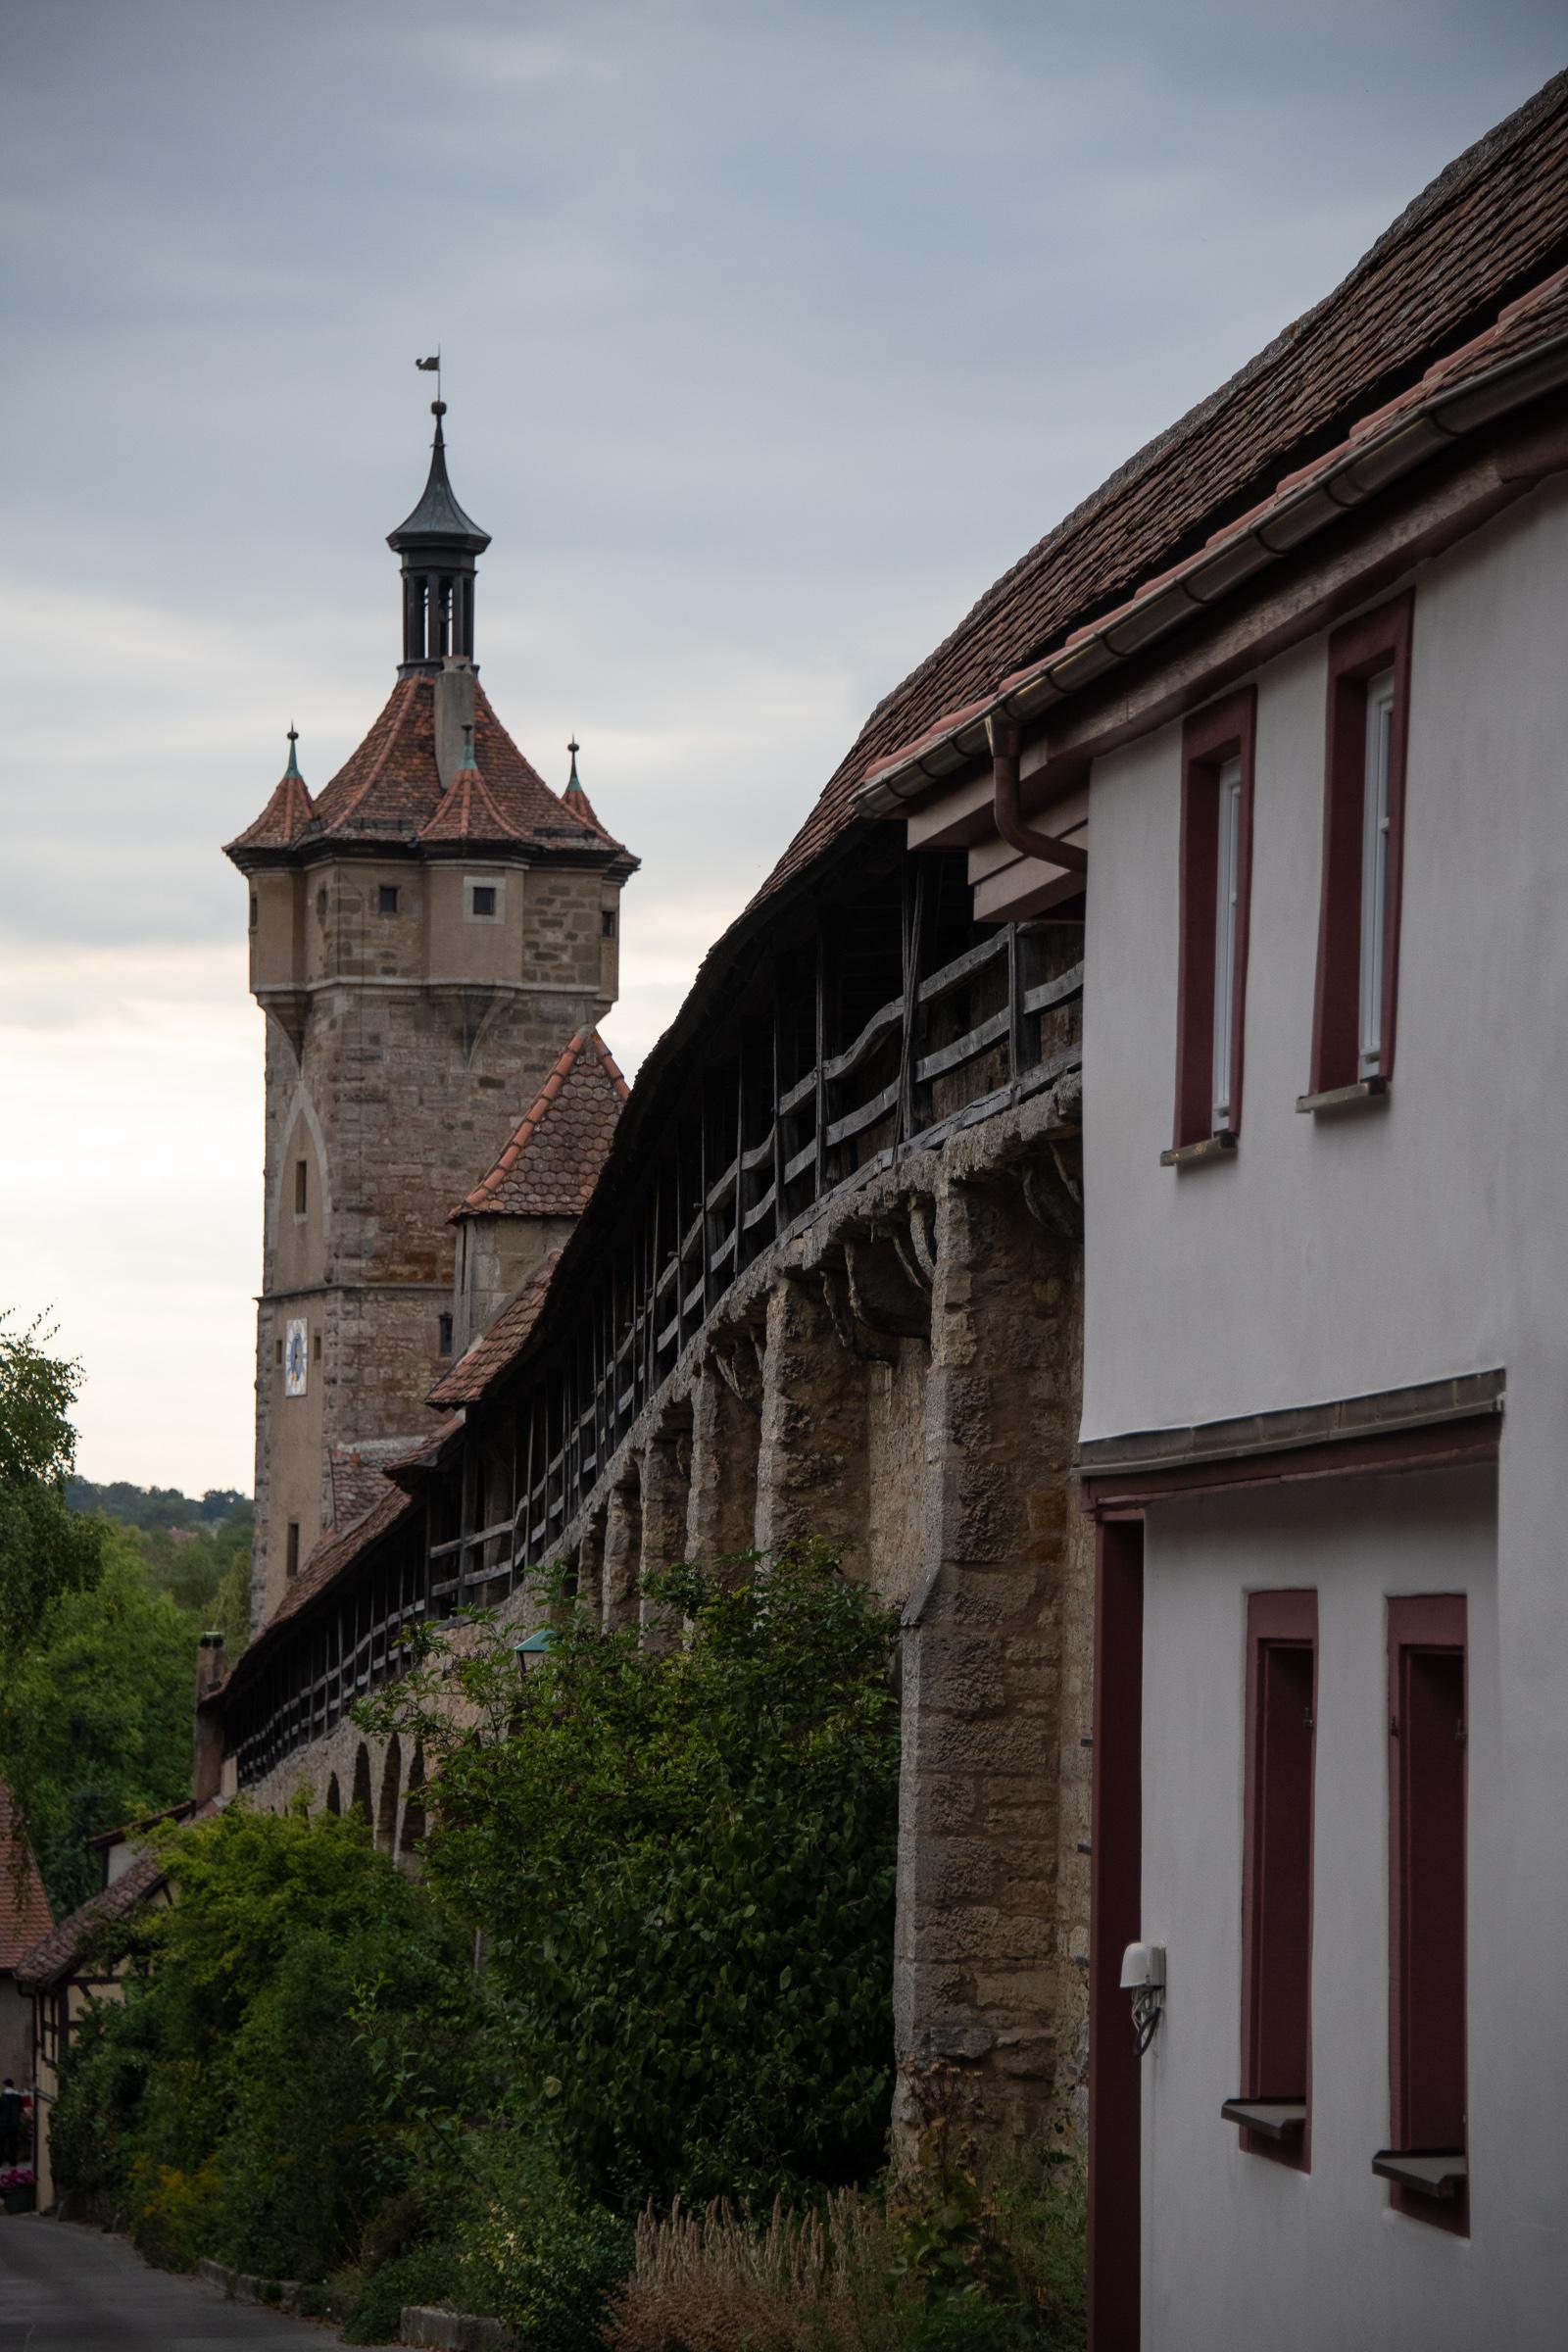 The Klingen Gate